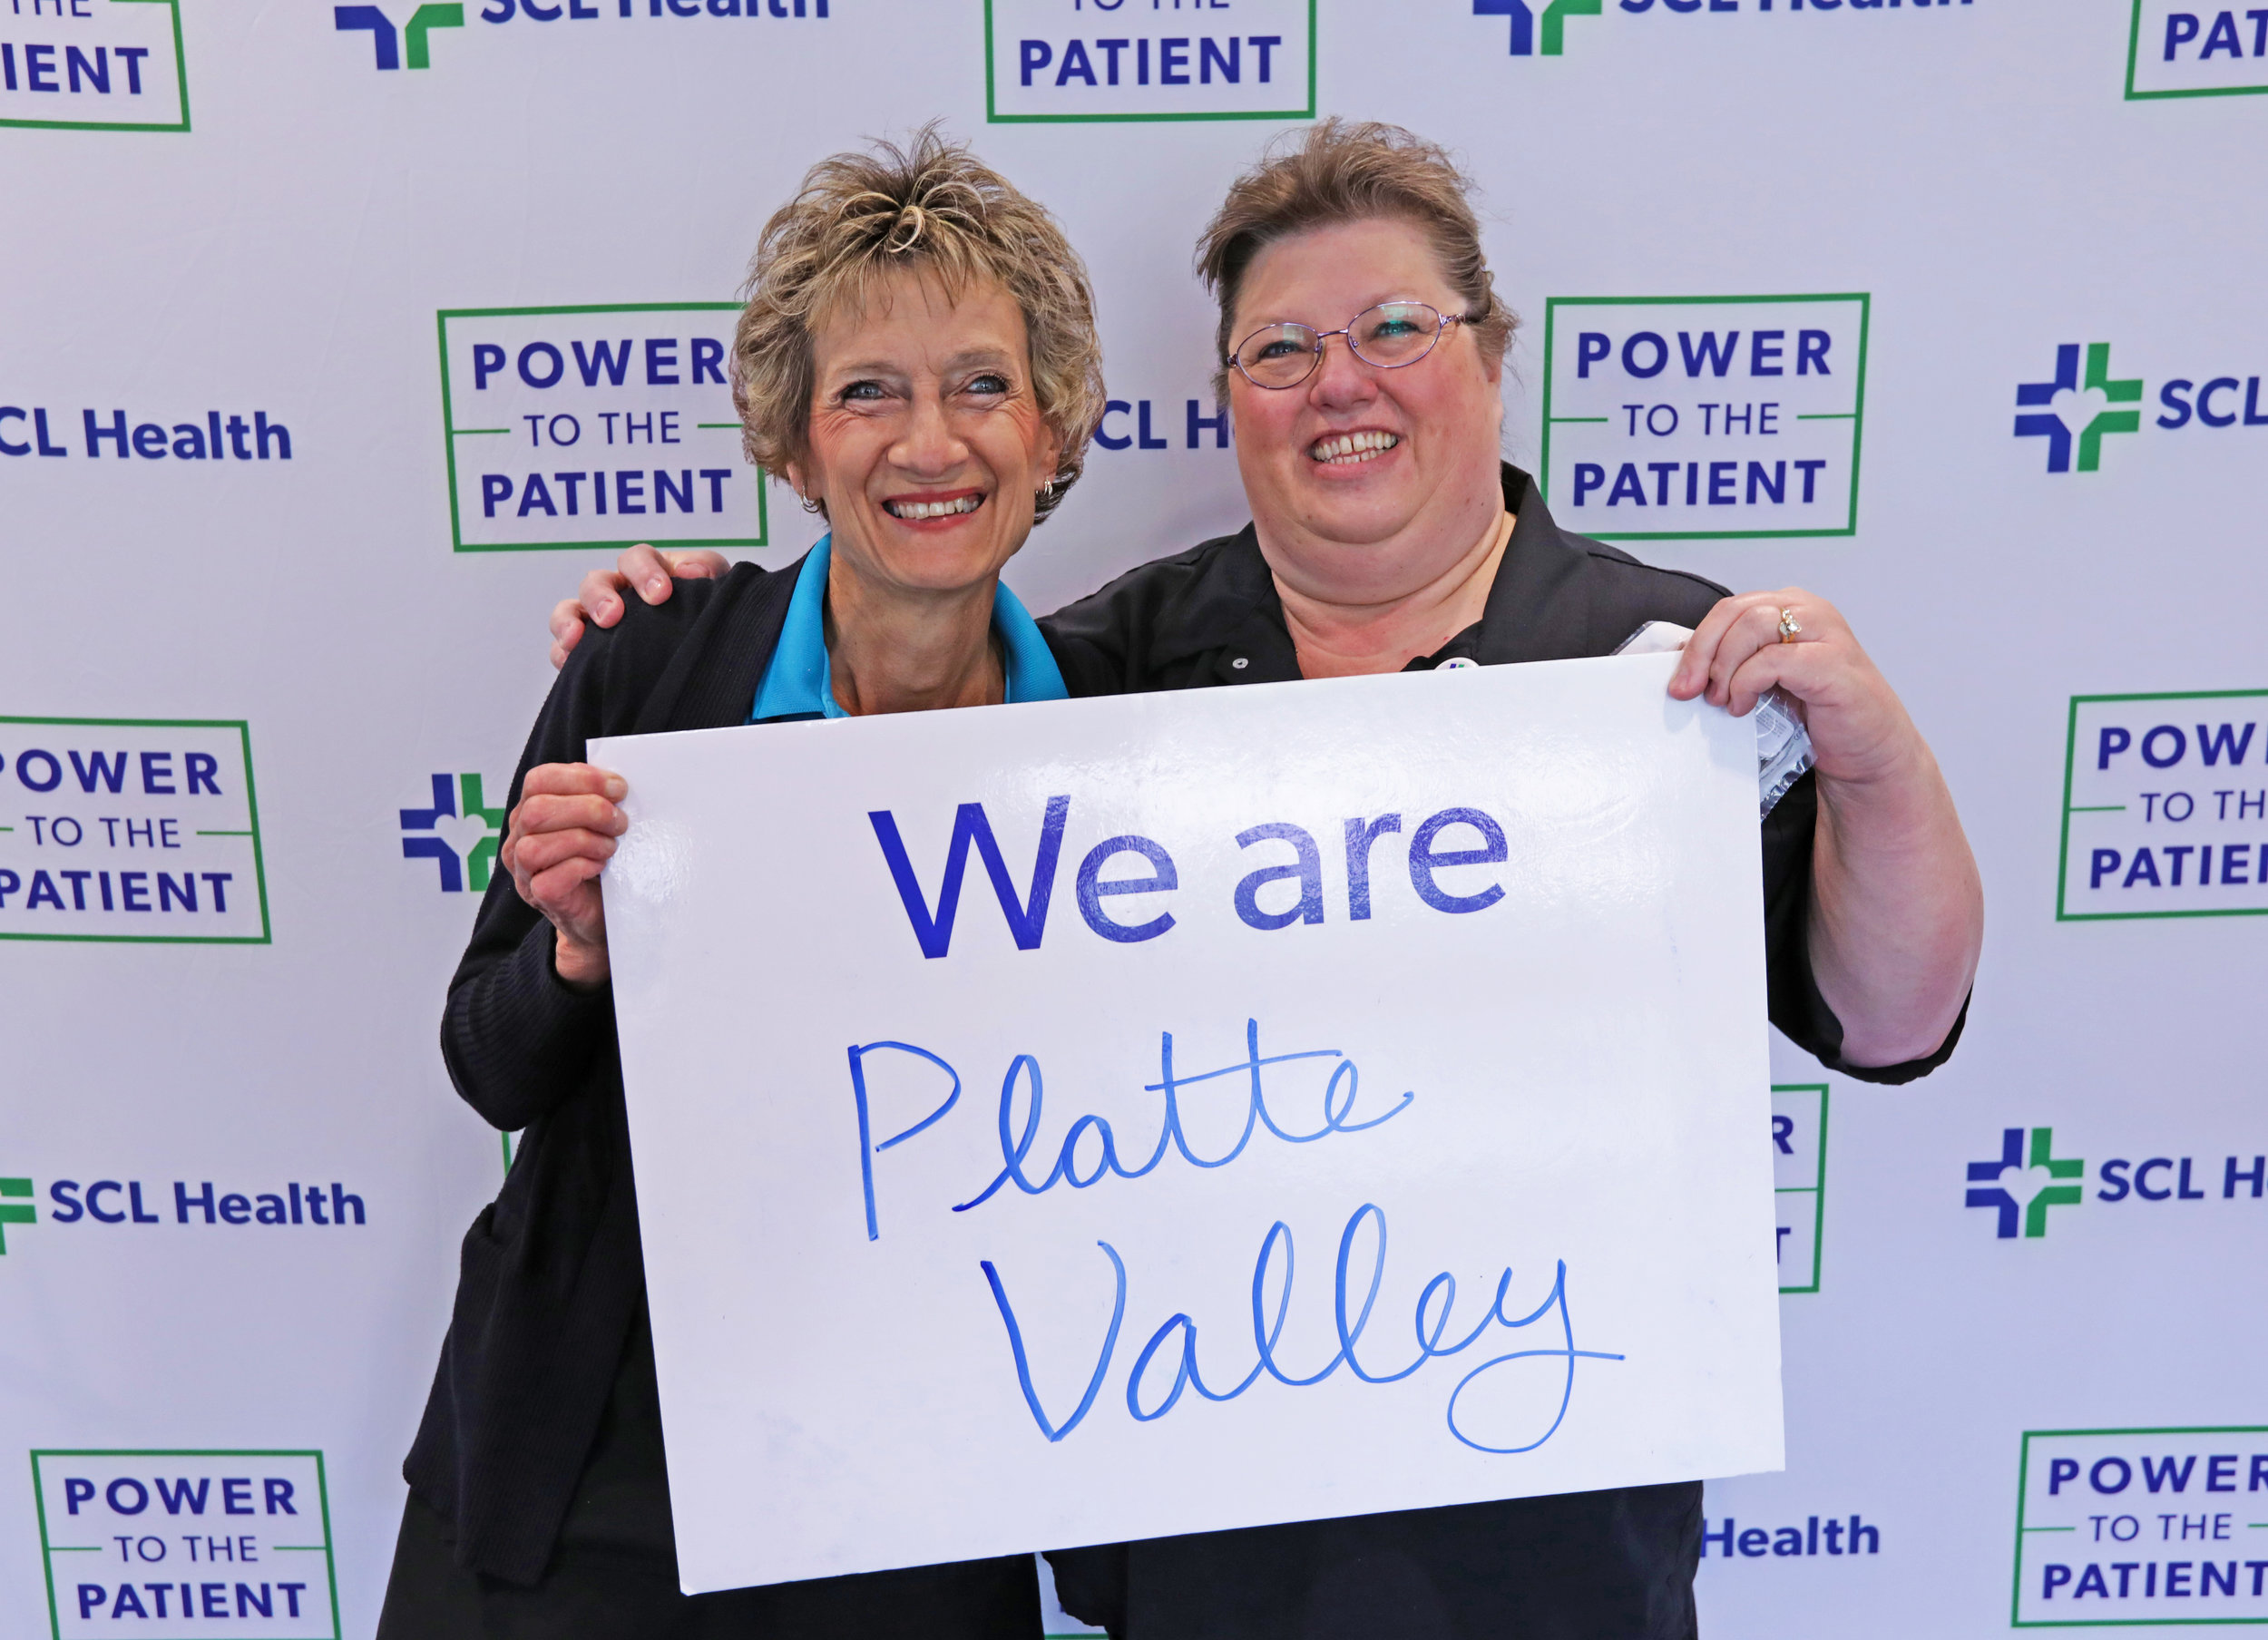 Platte Valley Brand Booth2.jpg